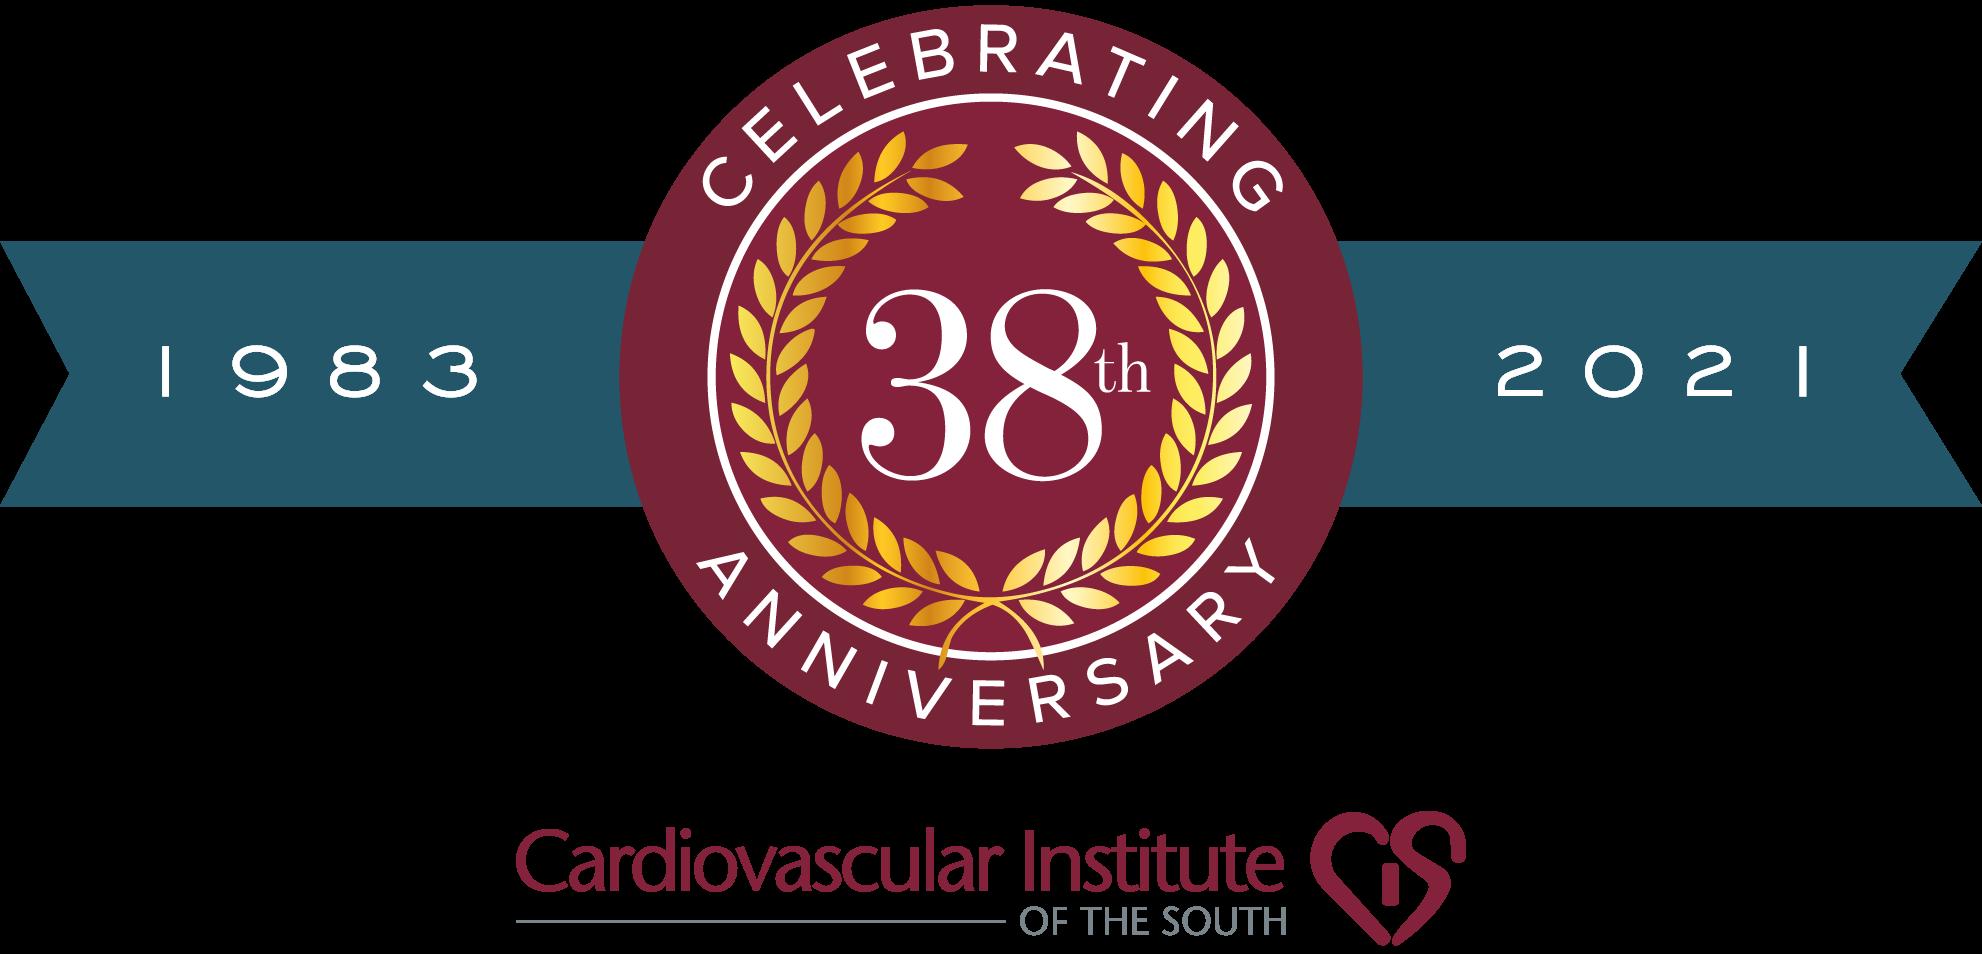 38th Anniversary Logo